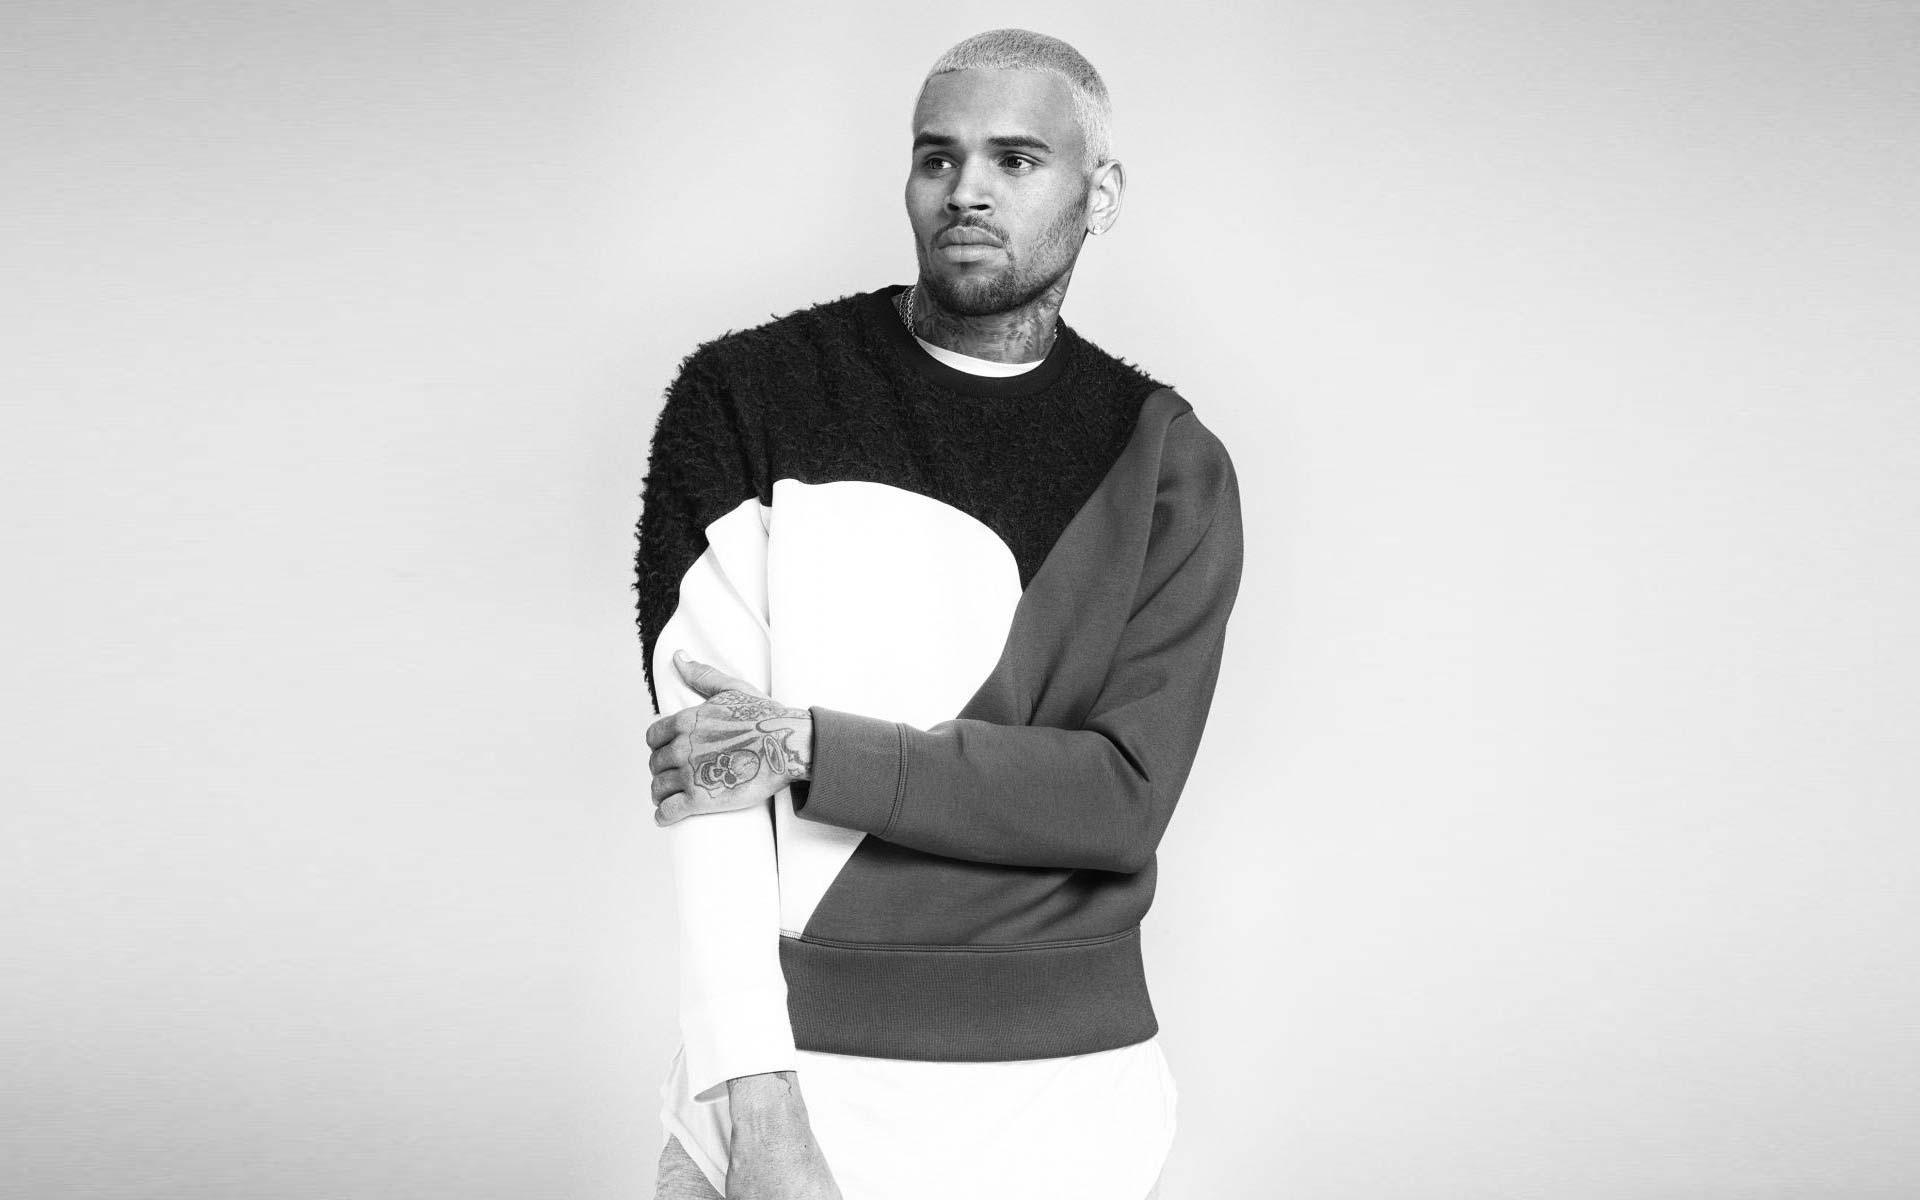 Chris Brown Wallpapers HD Download